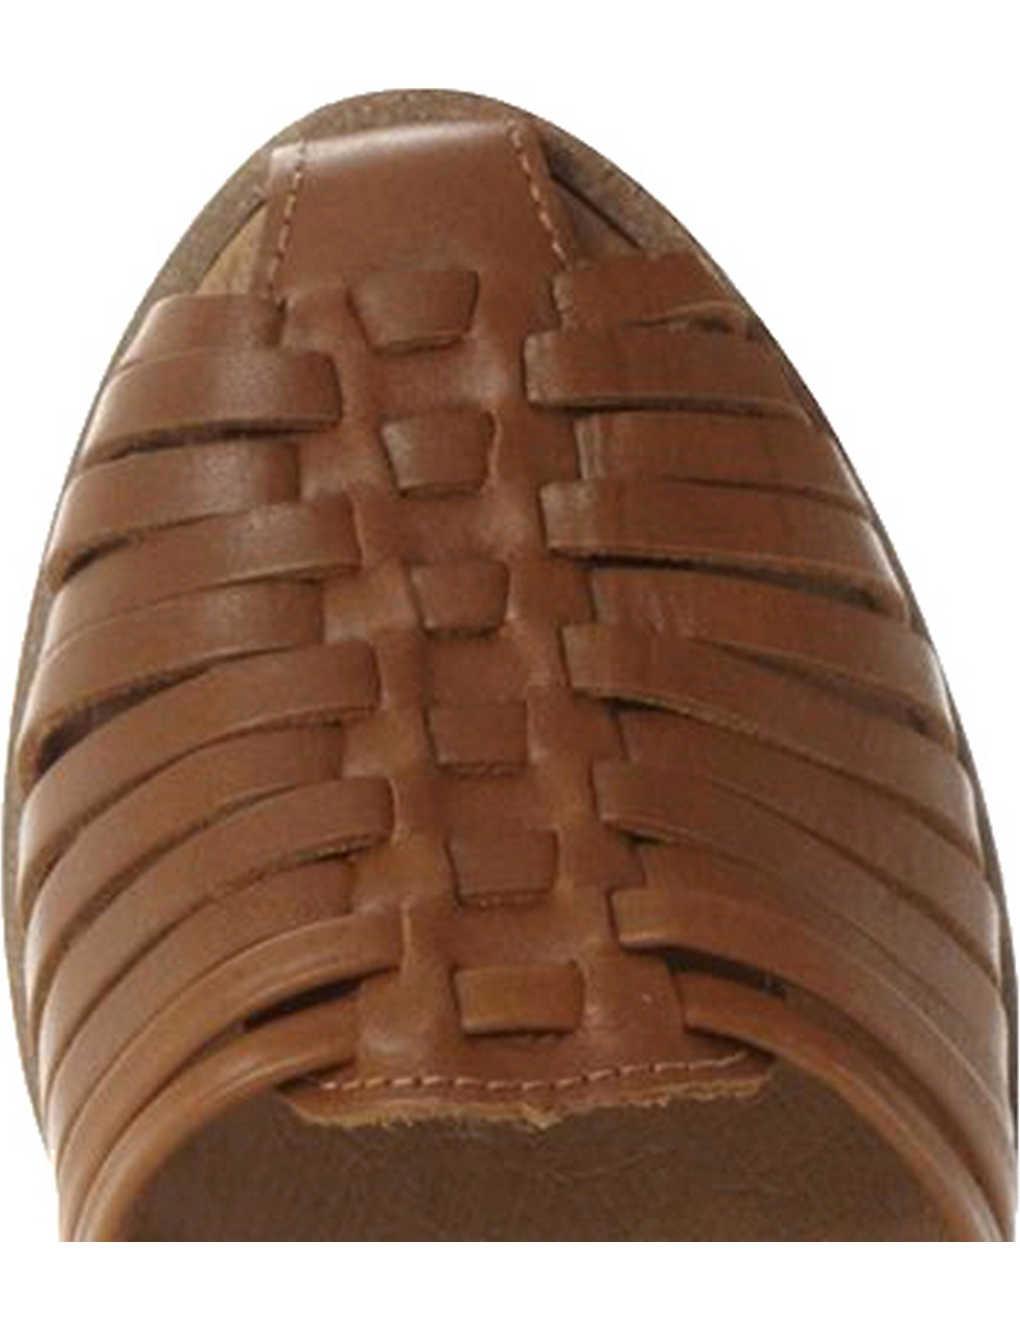 8918d98a31307 Hillarie leather huarache sandals  Hillarie leather huarache sandals ...